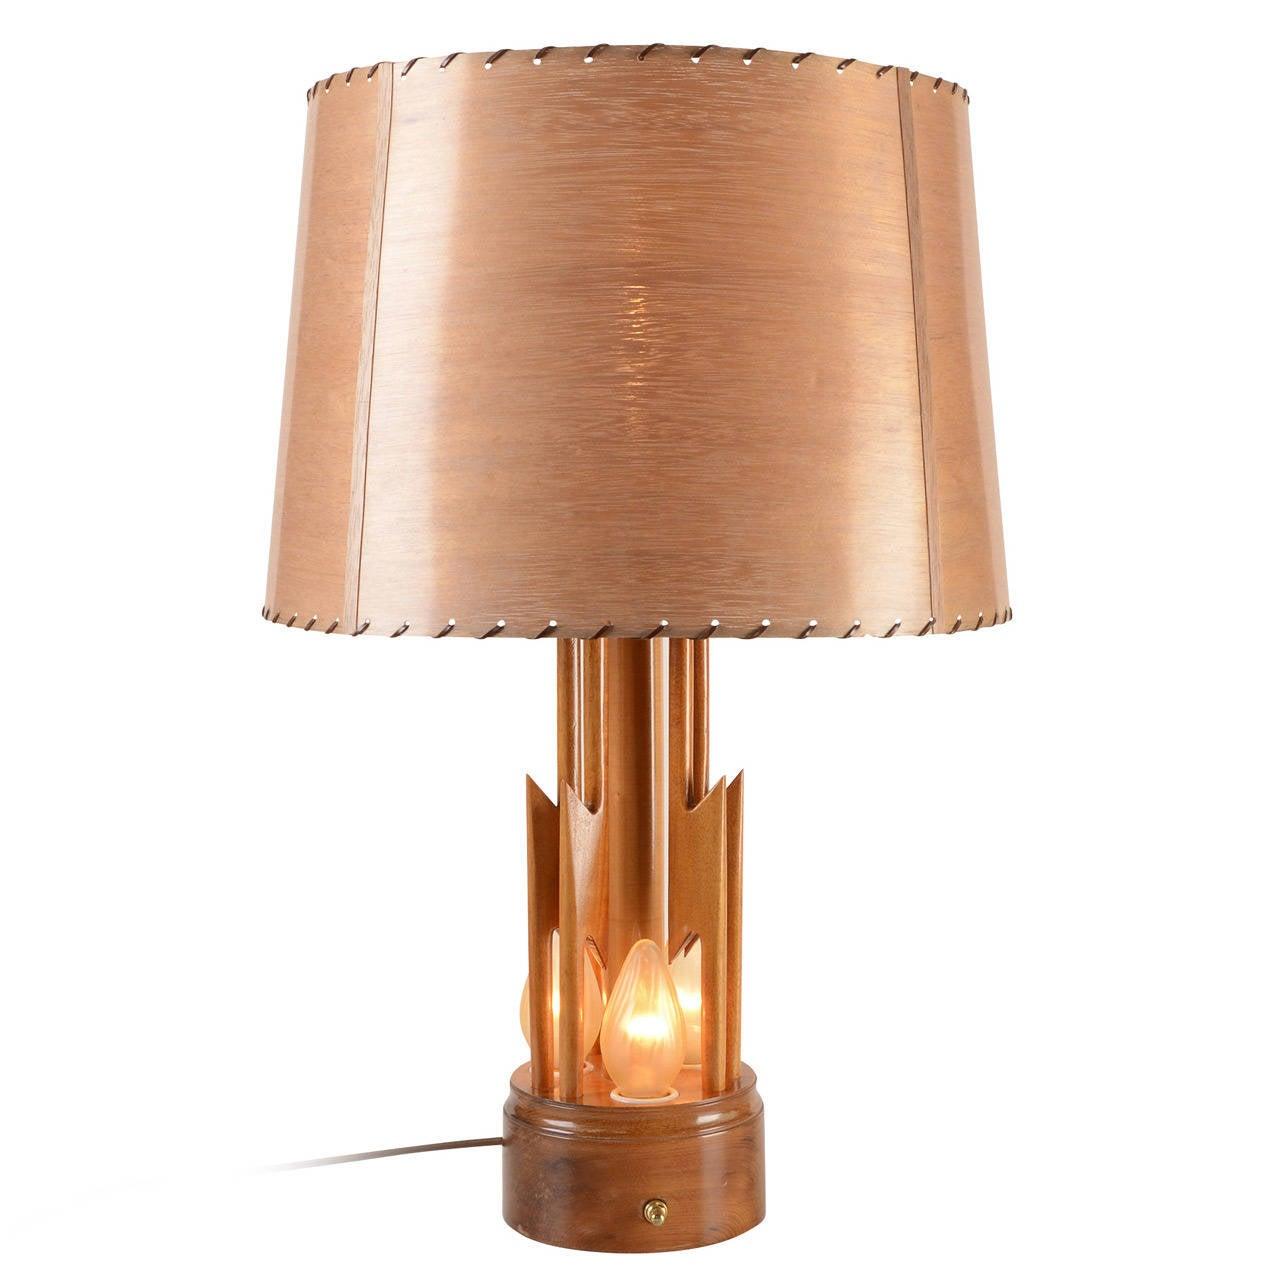 mid century wood lightning bolt table lamp circa 1950s at 1stdibs. Black Bedroom Furniture Sets. Home Design Ideas